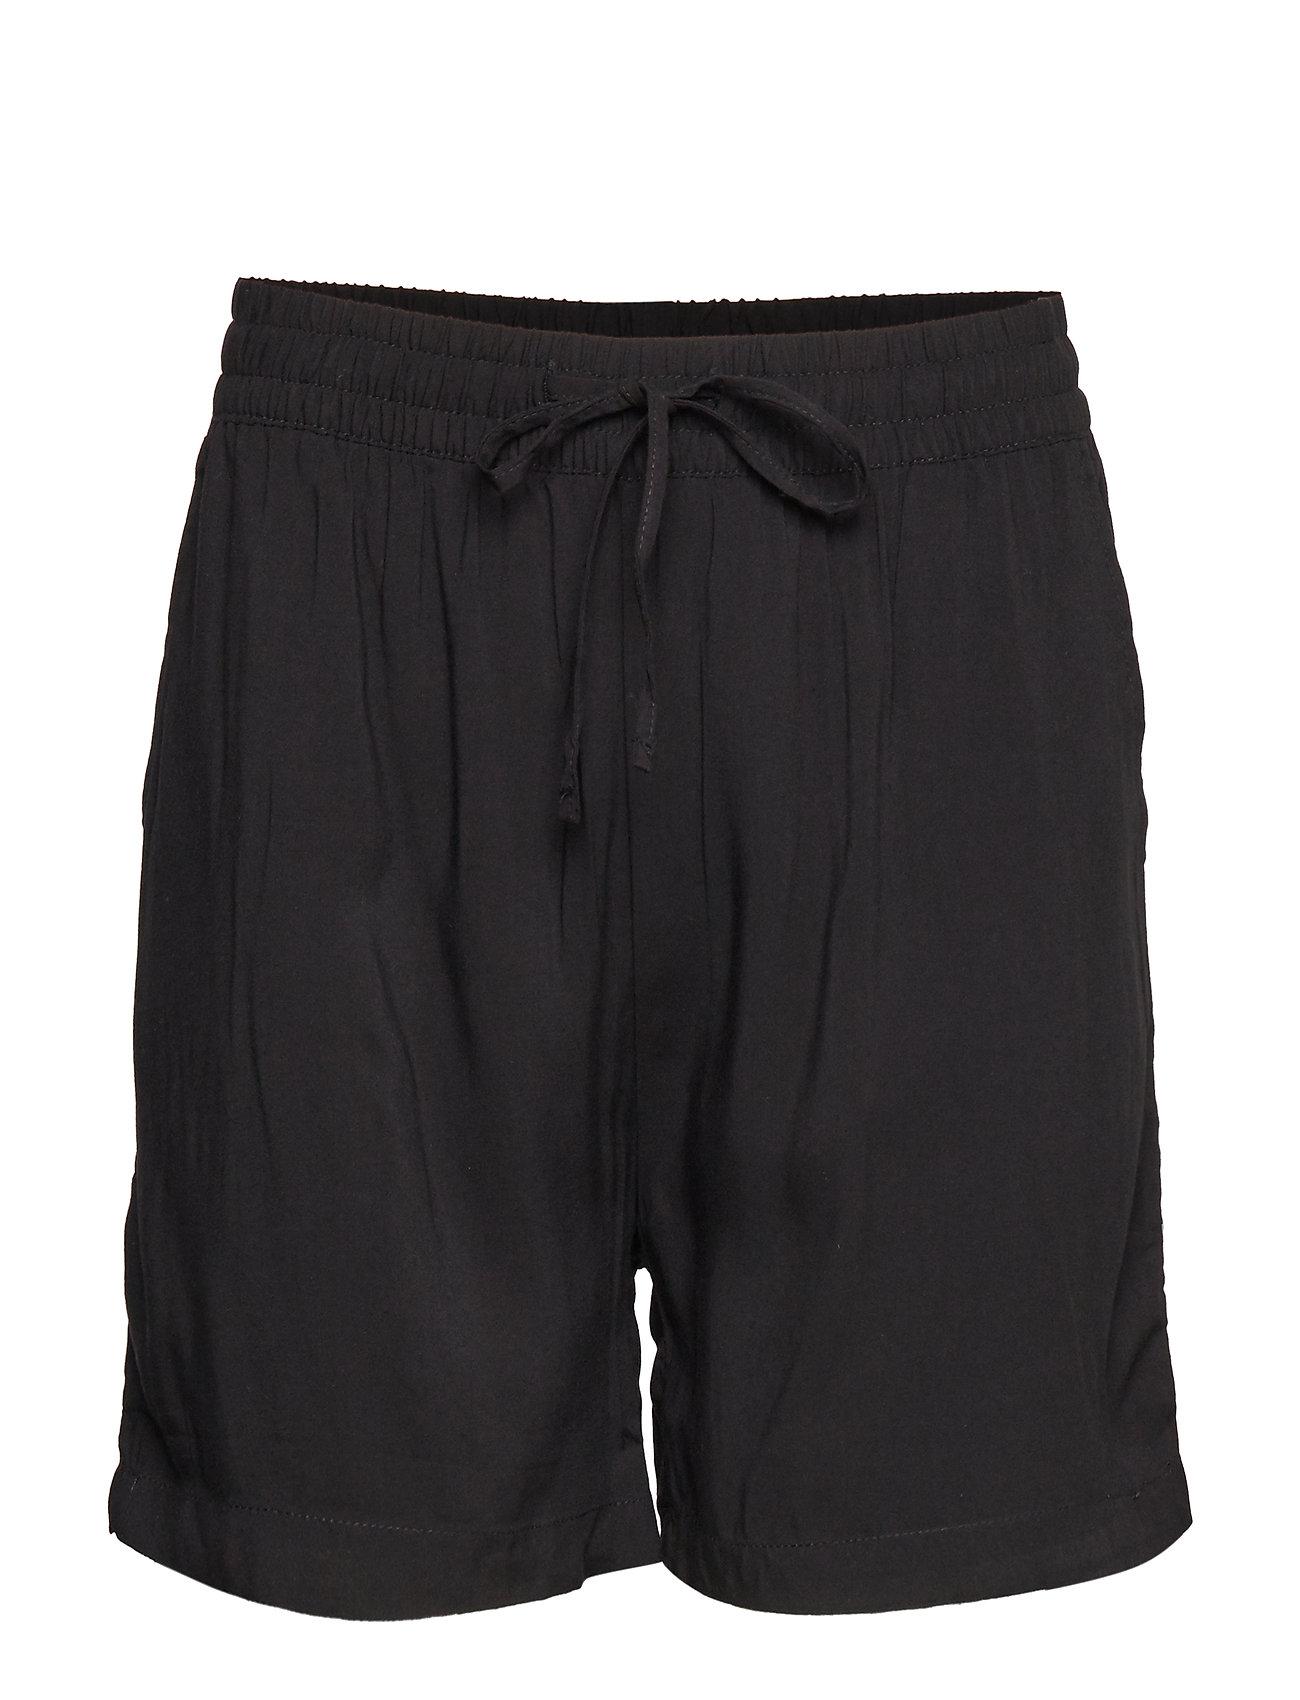 B.young BYHAILEY SHORTS Shorts